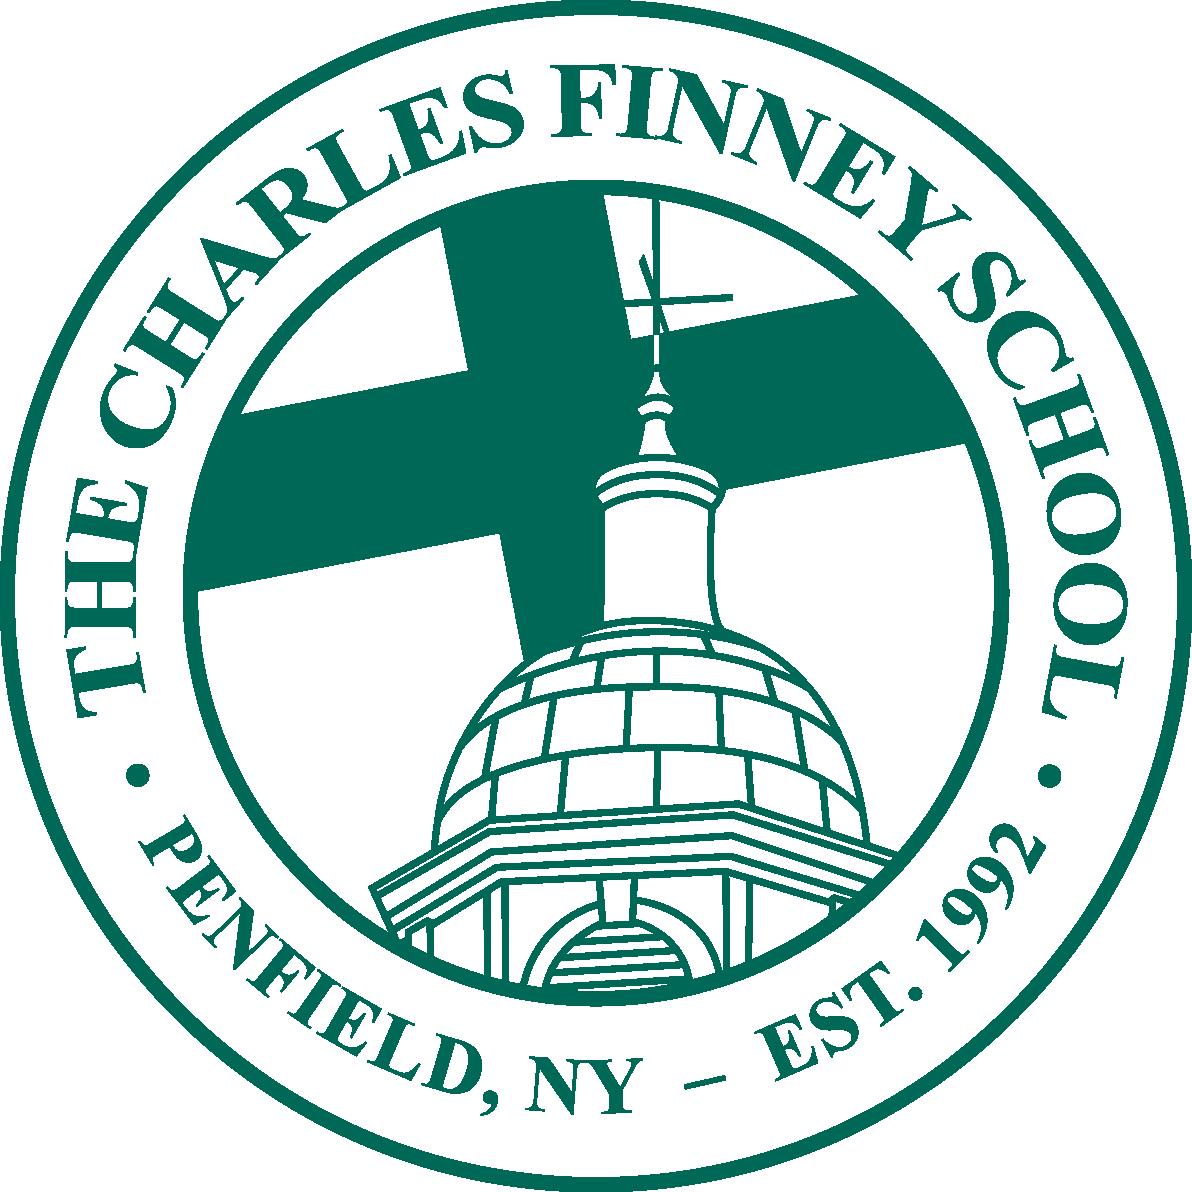 The Charles Finney School Wikipedia